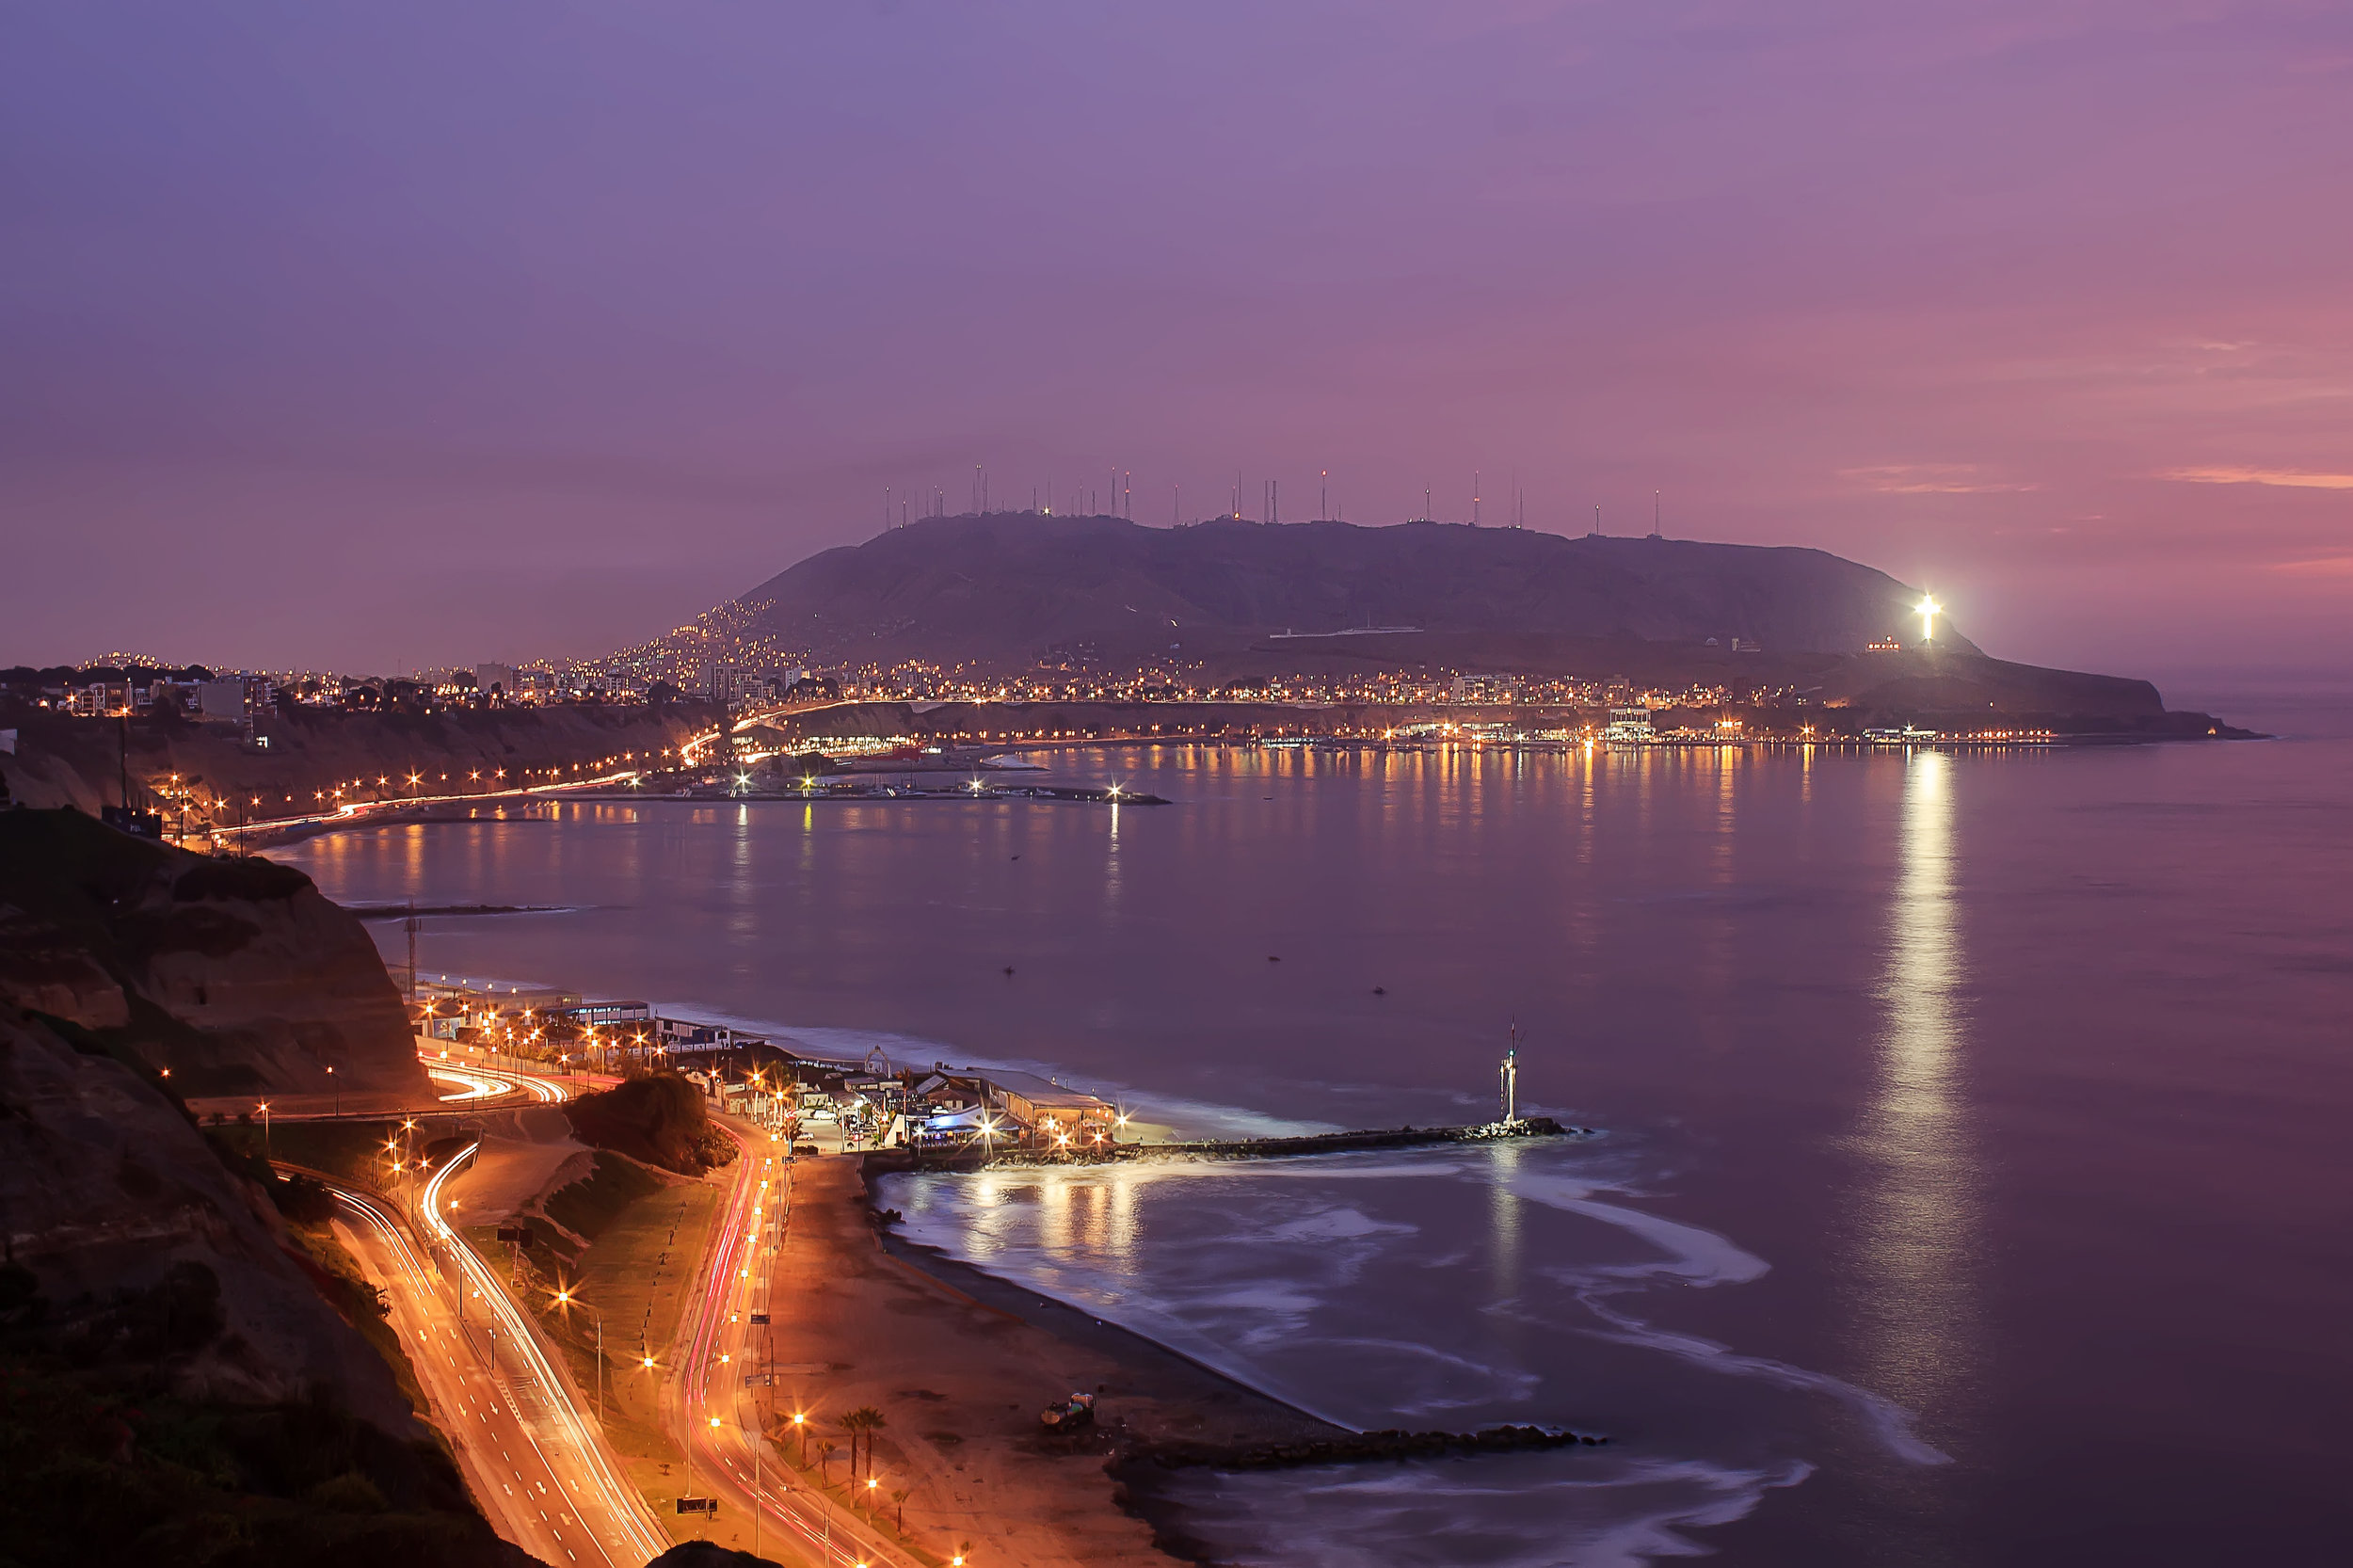 Peru - rundreise med luksus og spa-hotell Lima, Machu Picchu, Cuzco, Urubamba og Poroy